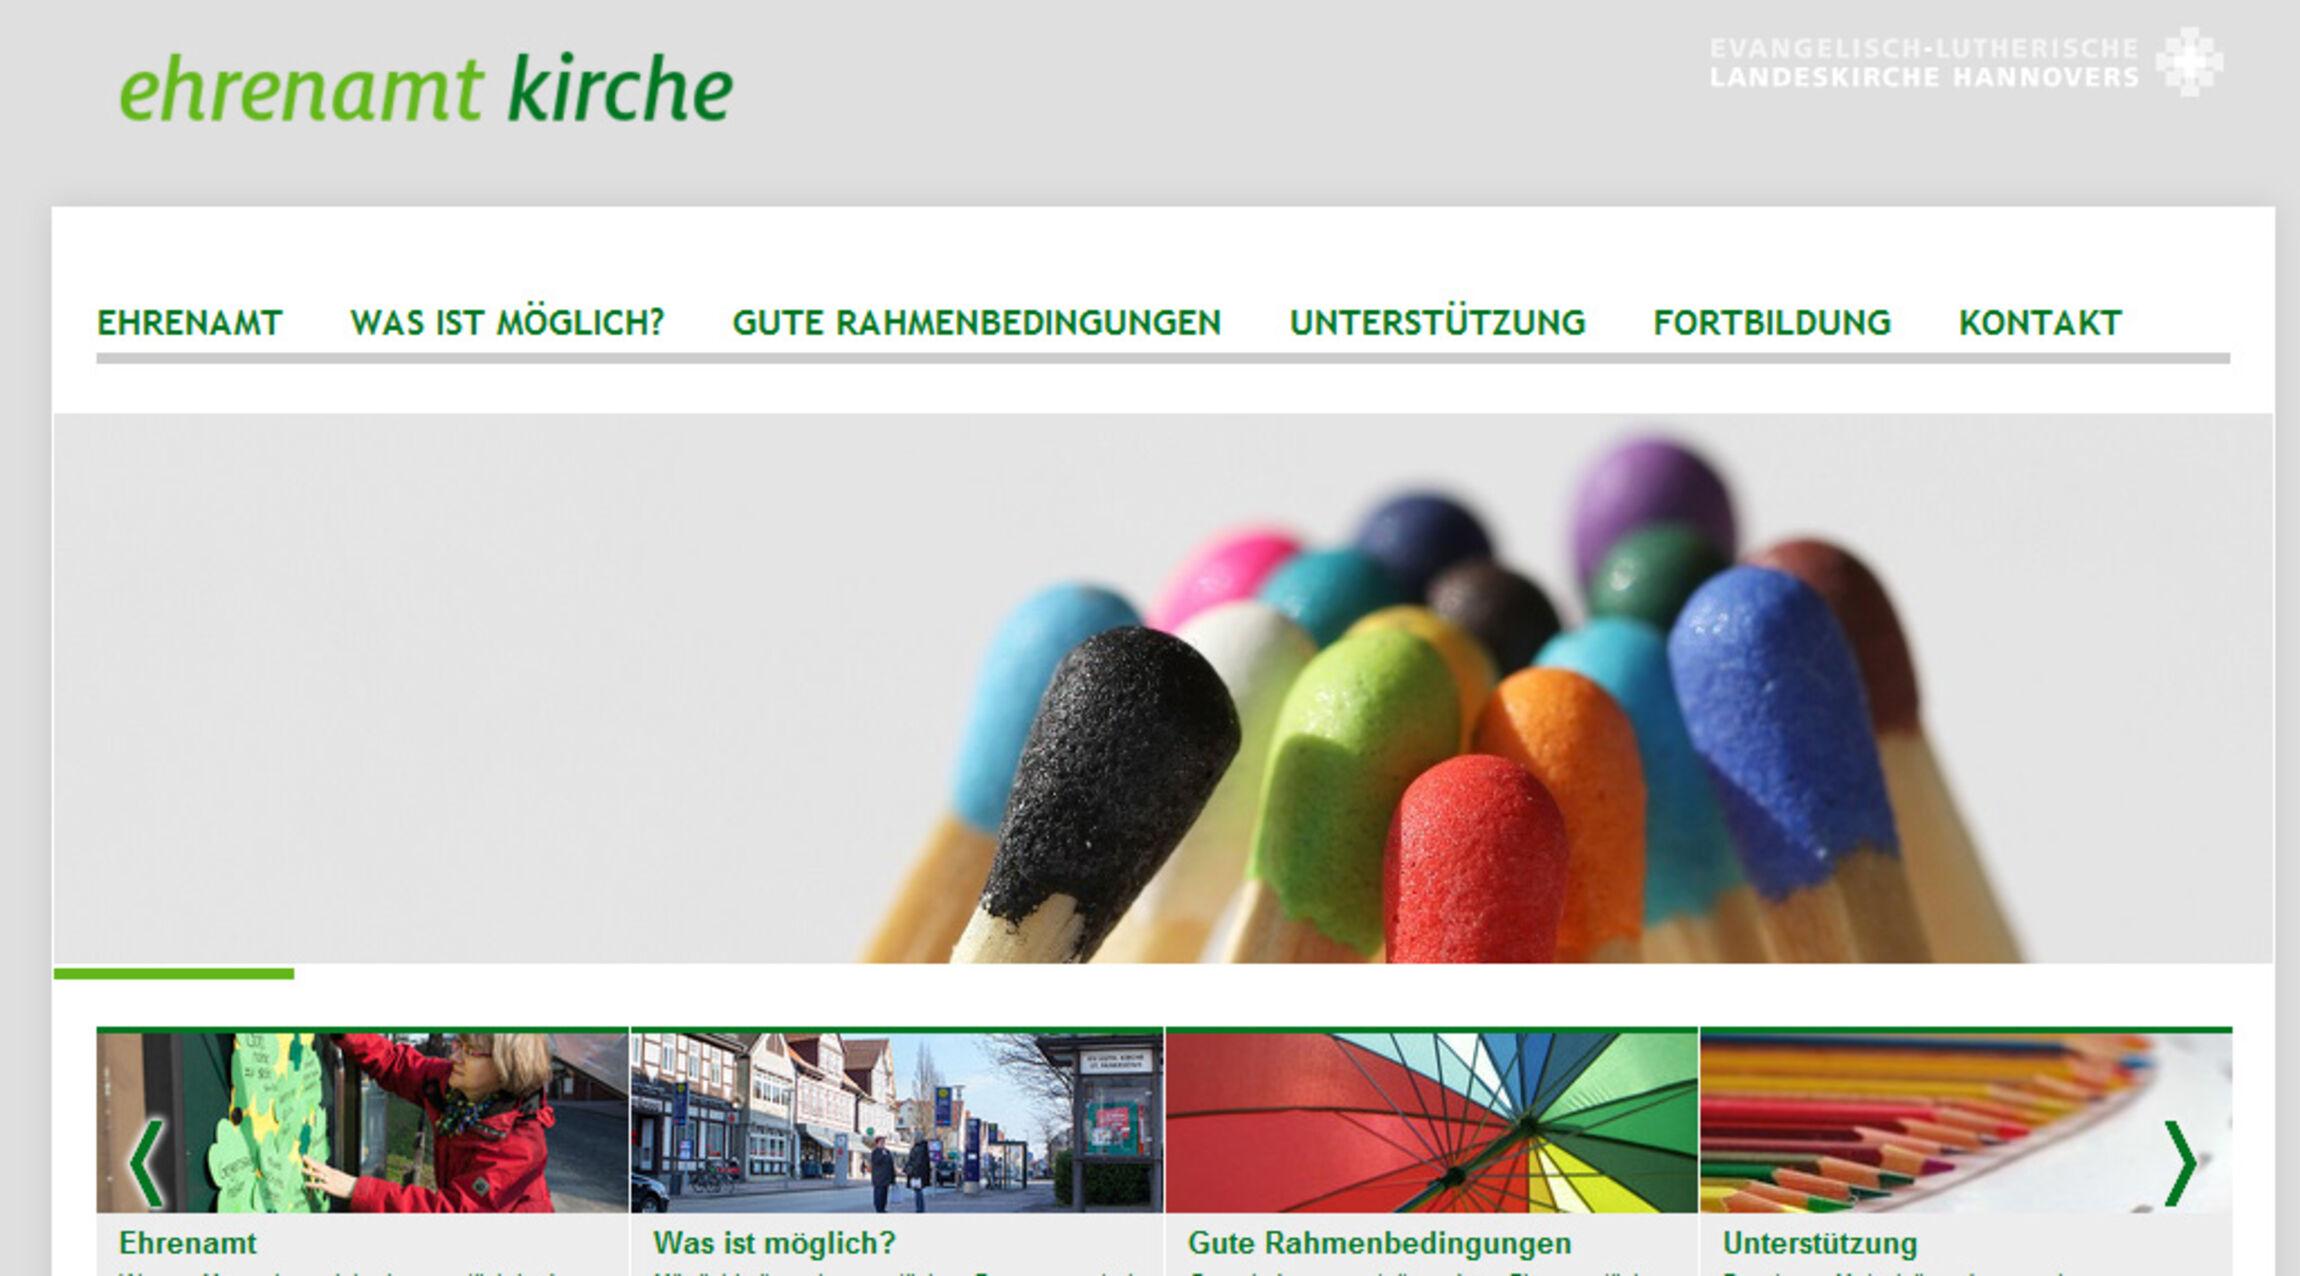 ehrenamt kriche website